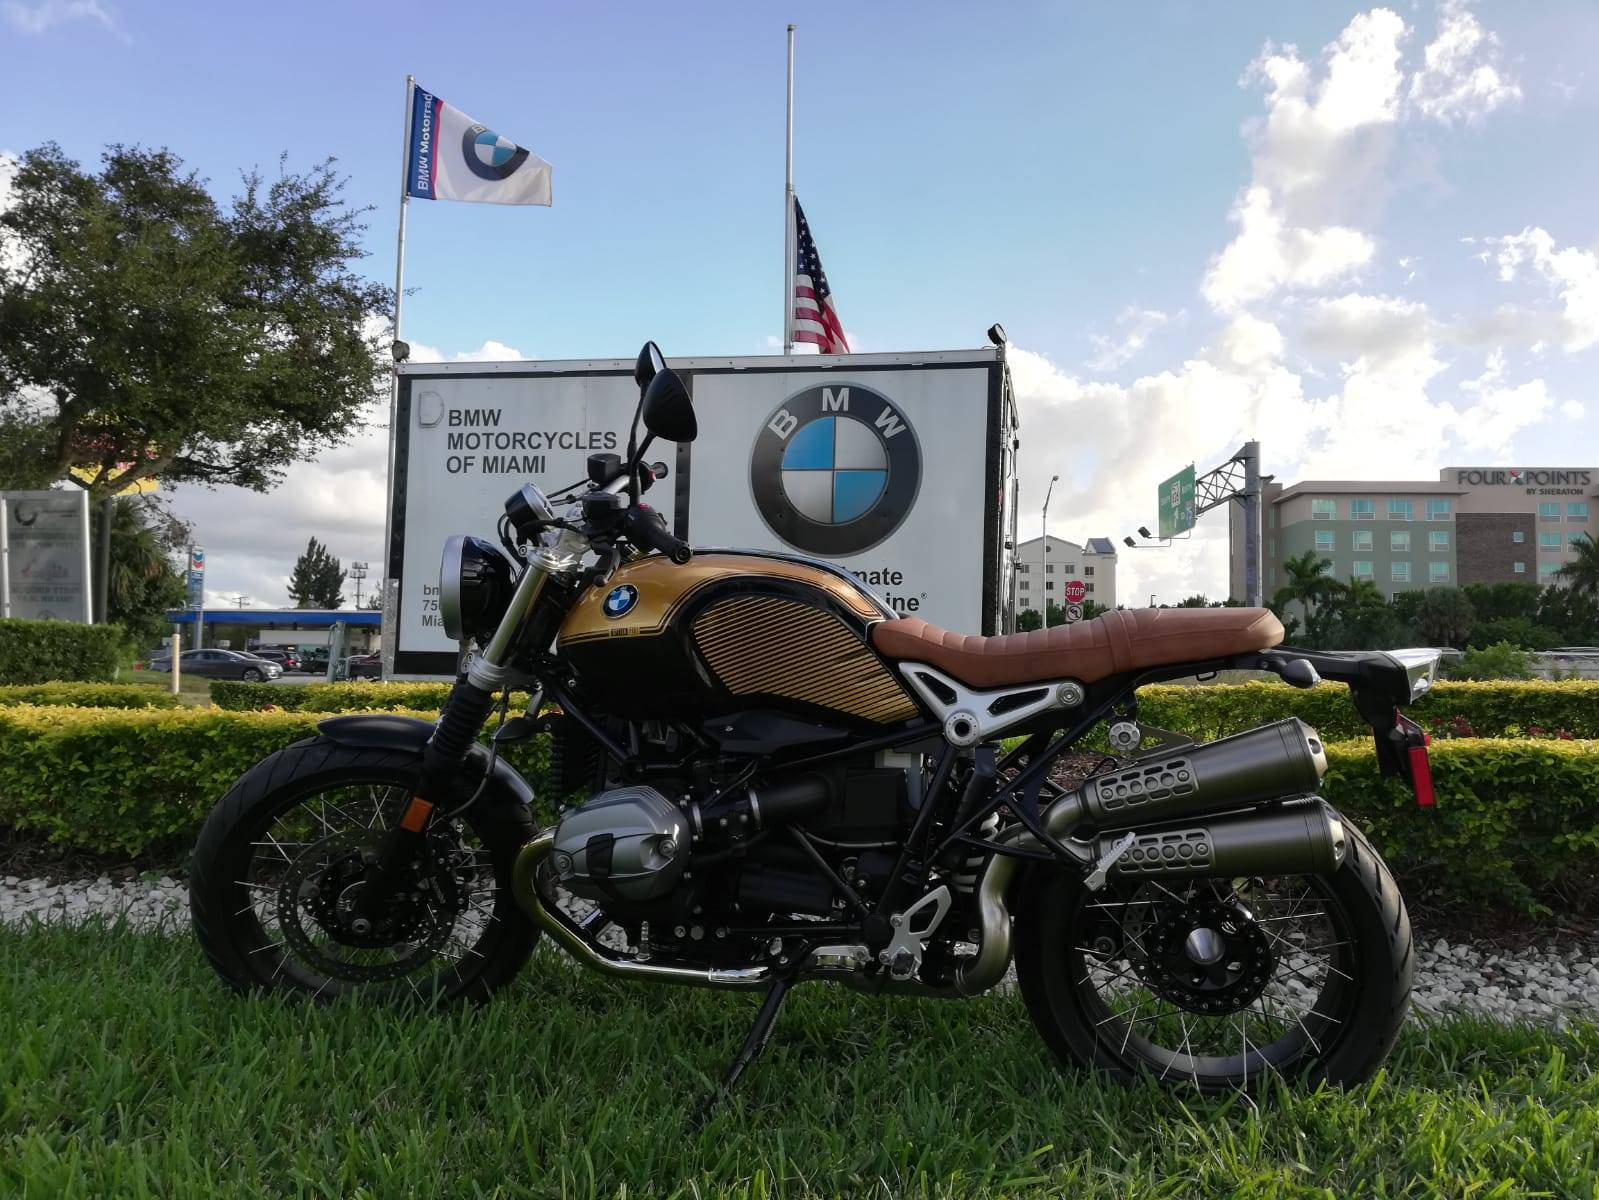 New 2019 Bmw R Ninet Scrambler Motorcycles In Miami Fl